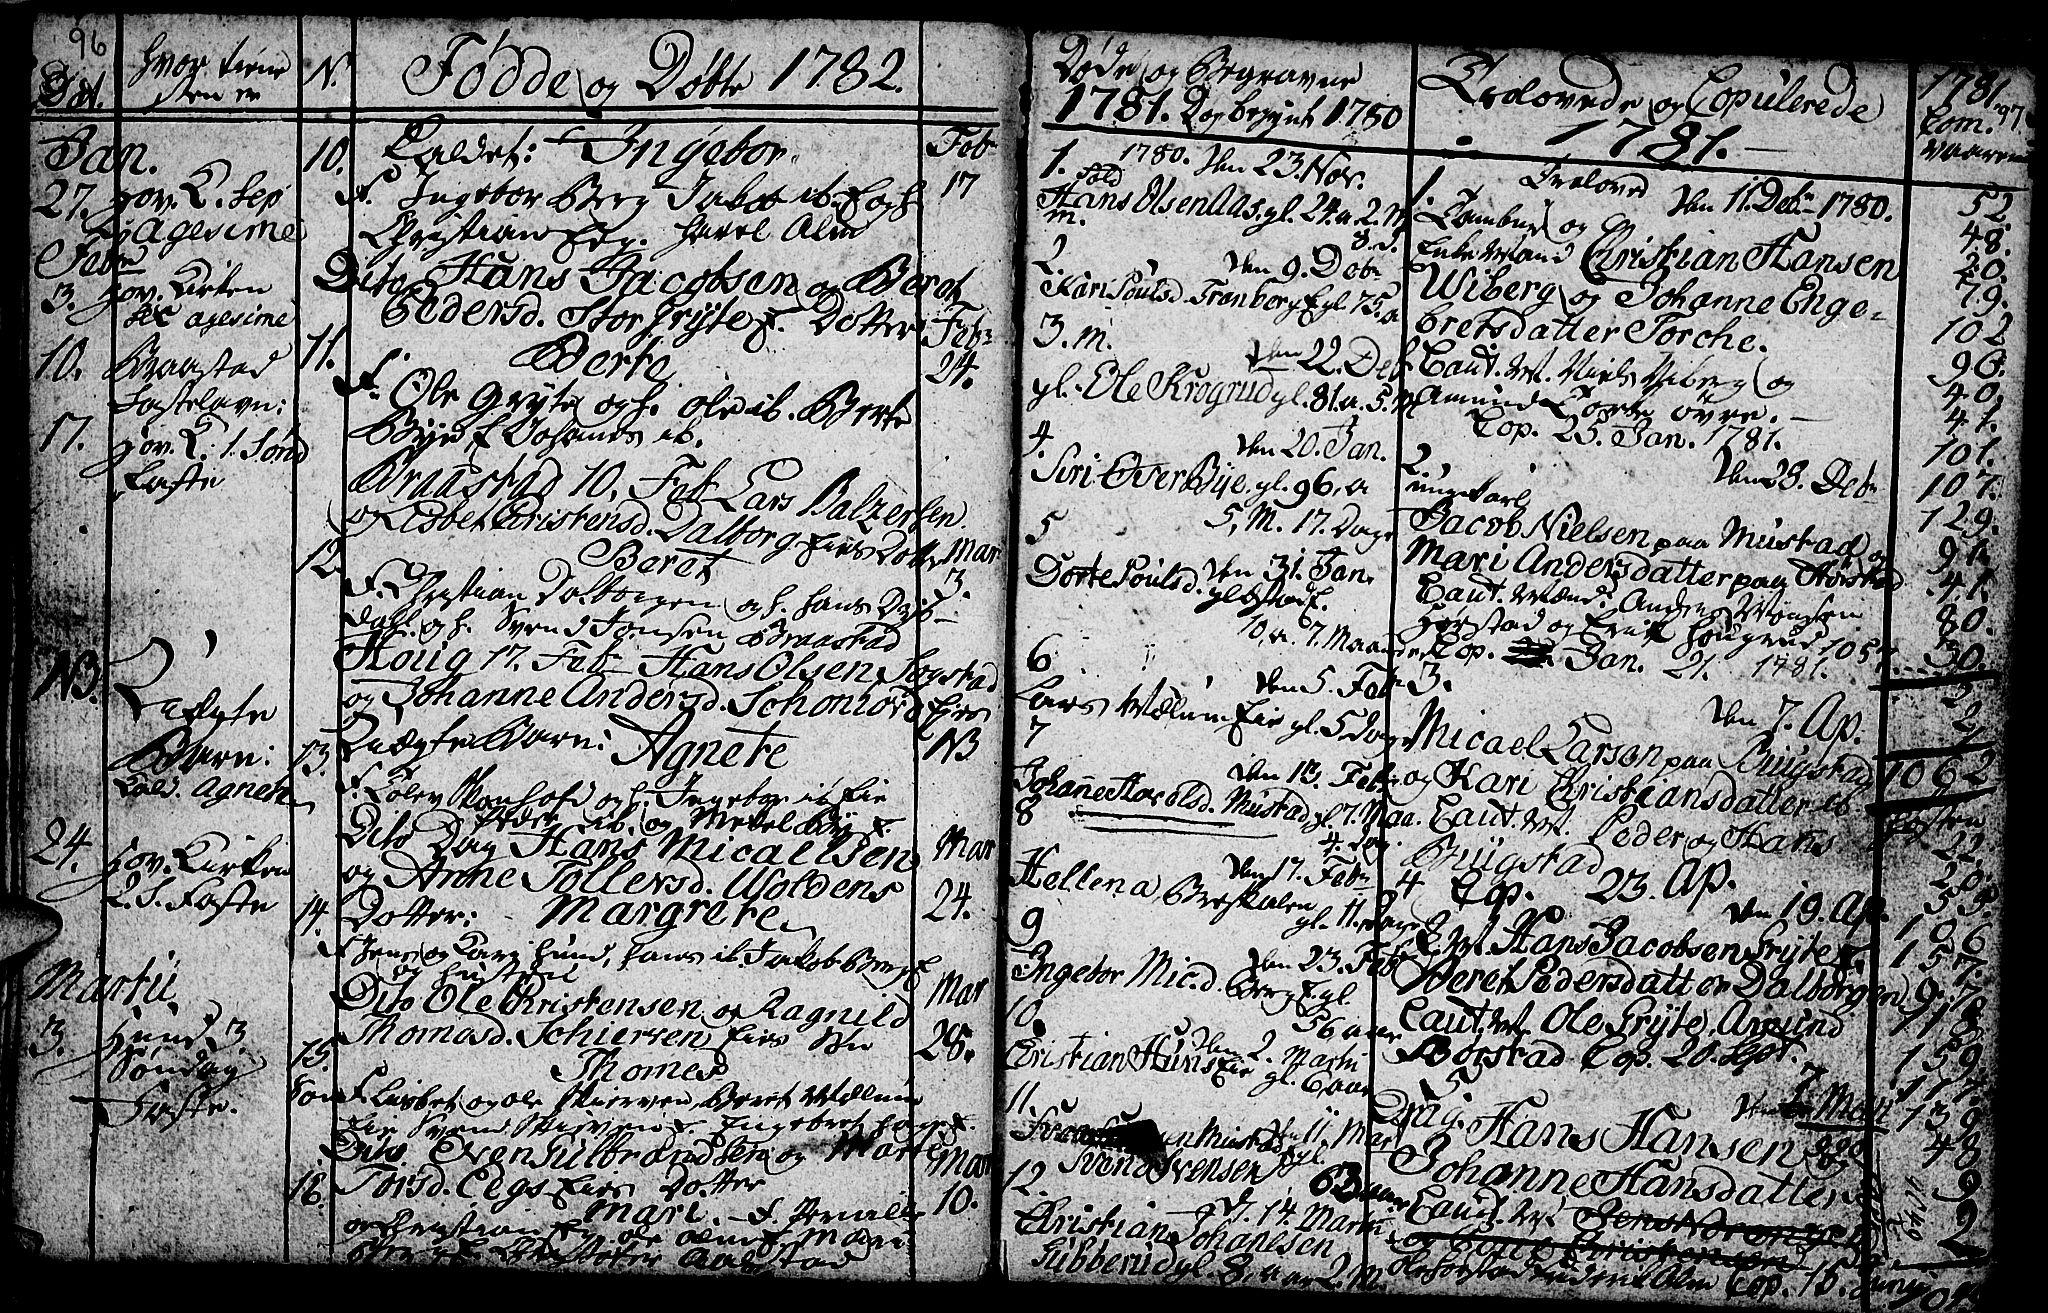 SAH, Vardal prestekontor, H/Ha/Hab/L0001: Klokkerbok nr. 1, 1771-1790, s. 96-97